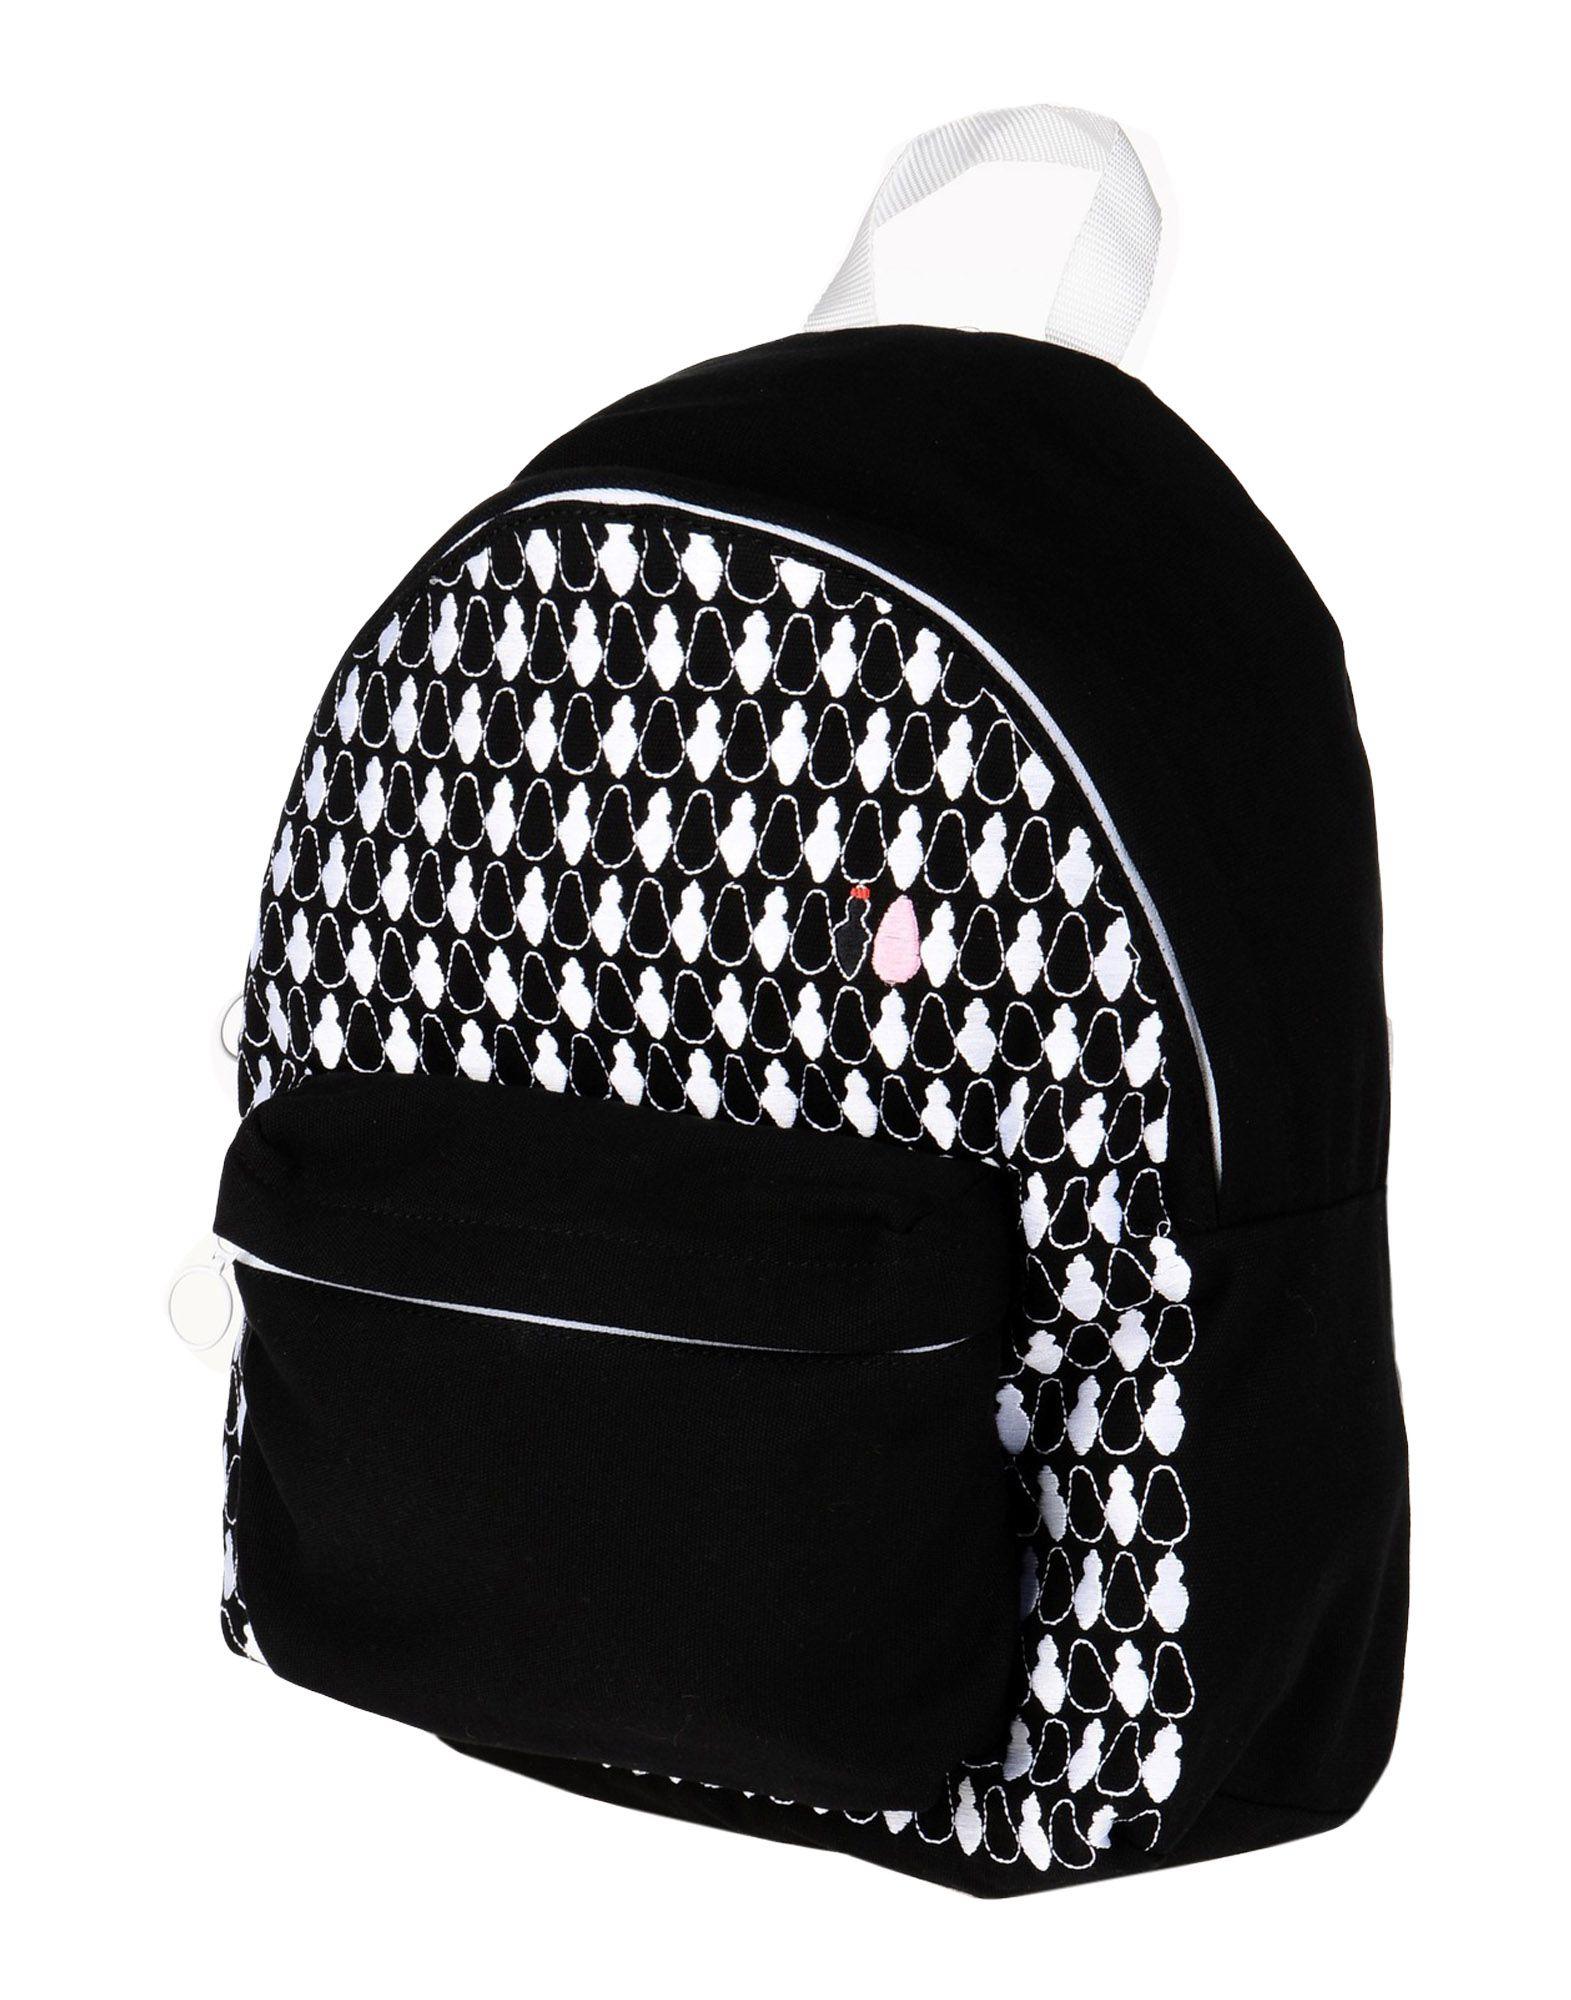 JOSHUA*S X BARBAPAPA Рюкзаки и сумки на пояс ночники pabobo ночничок barbapapa micro usb